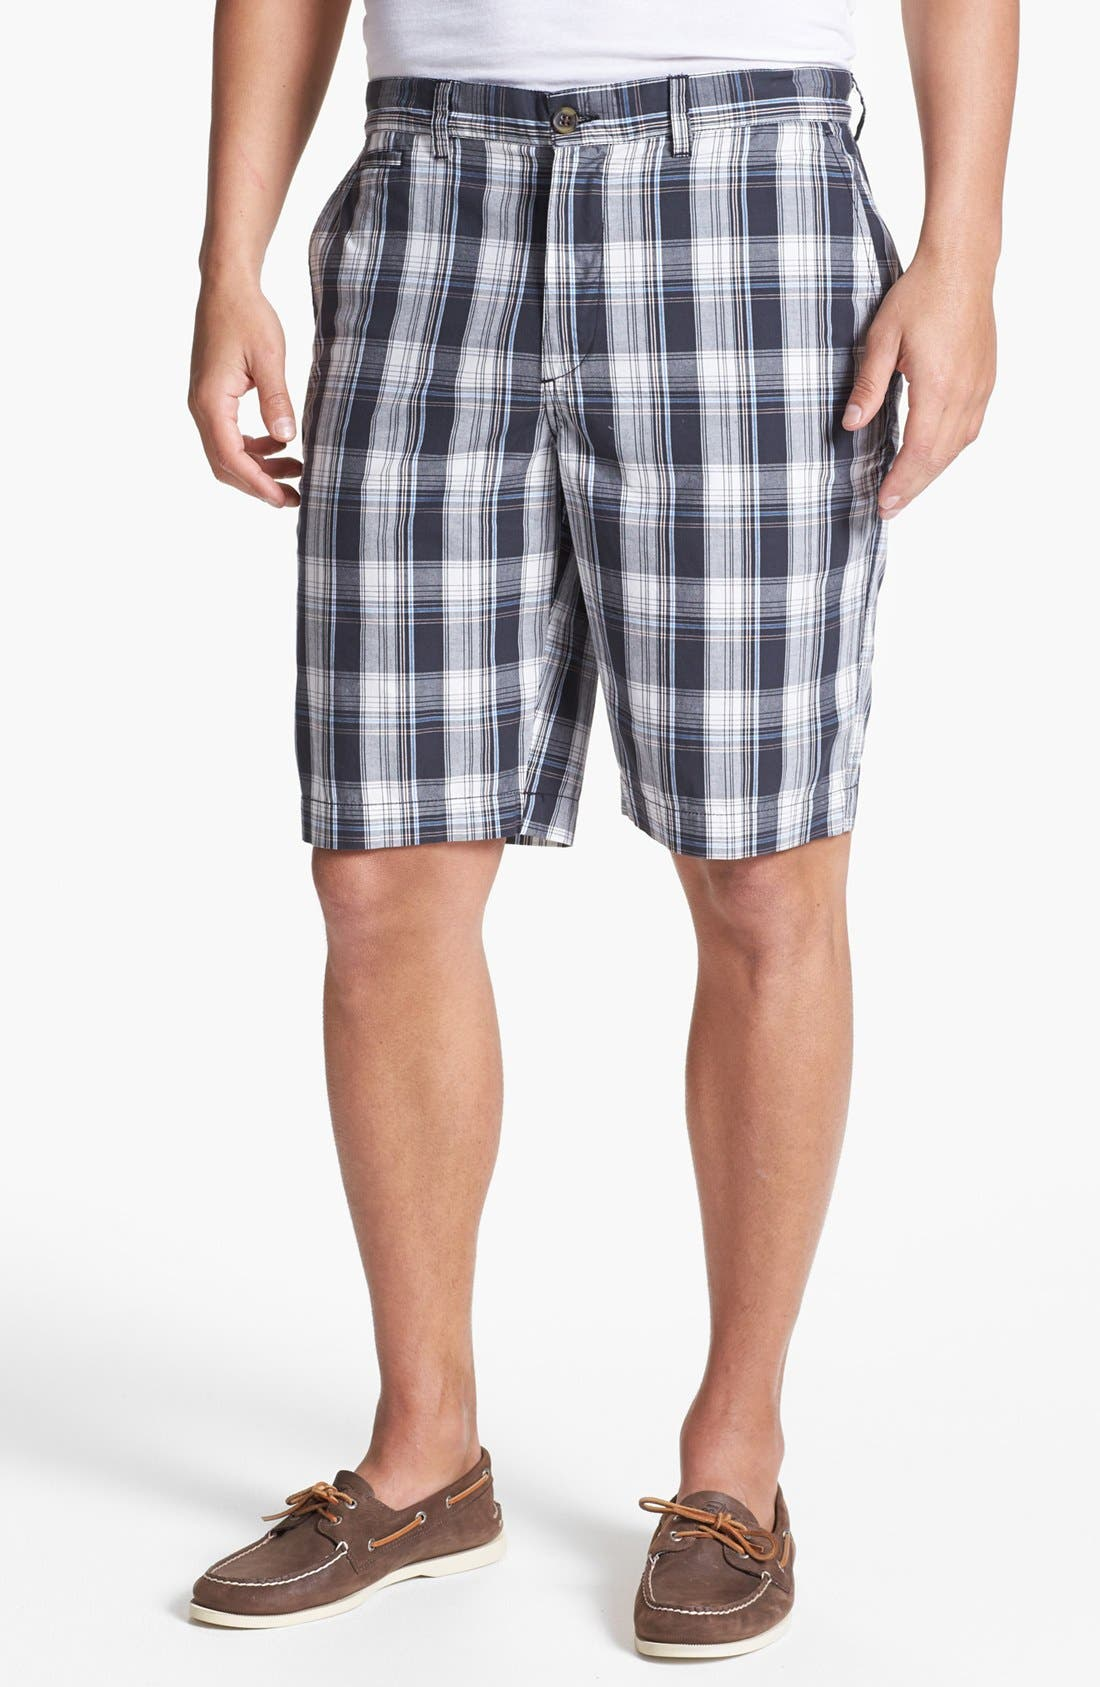 Main Image - Wallin & Bros. 'Lanspur' Shorts